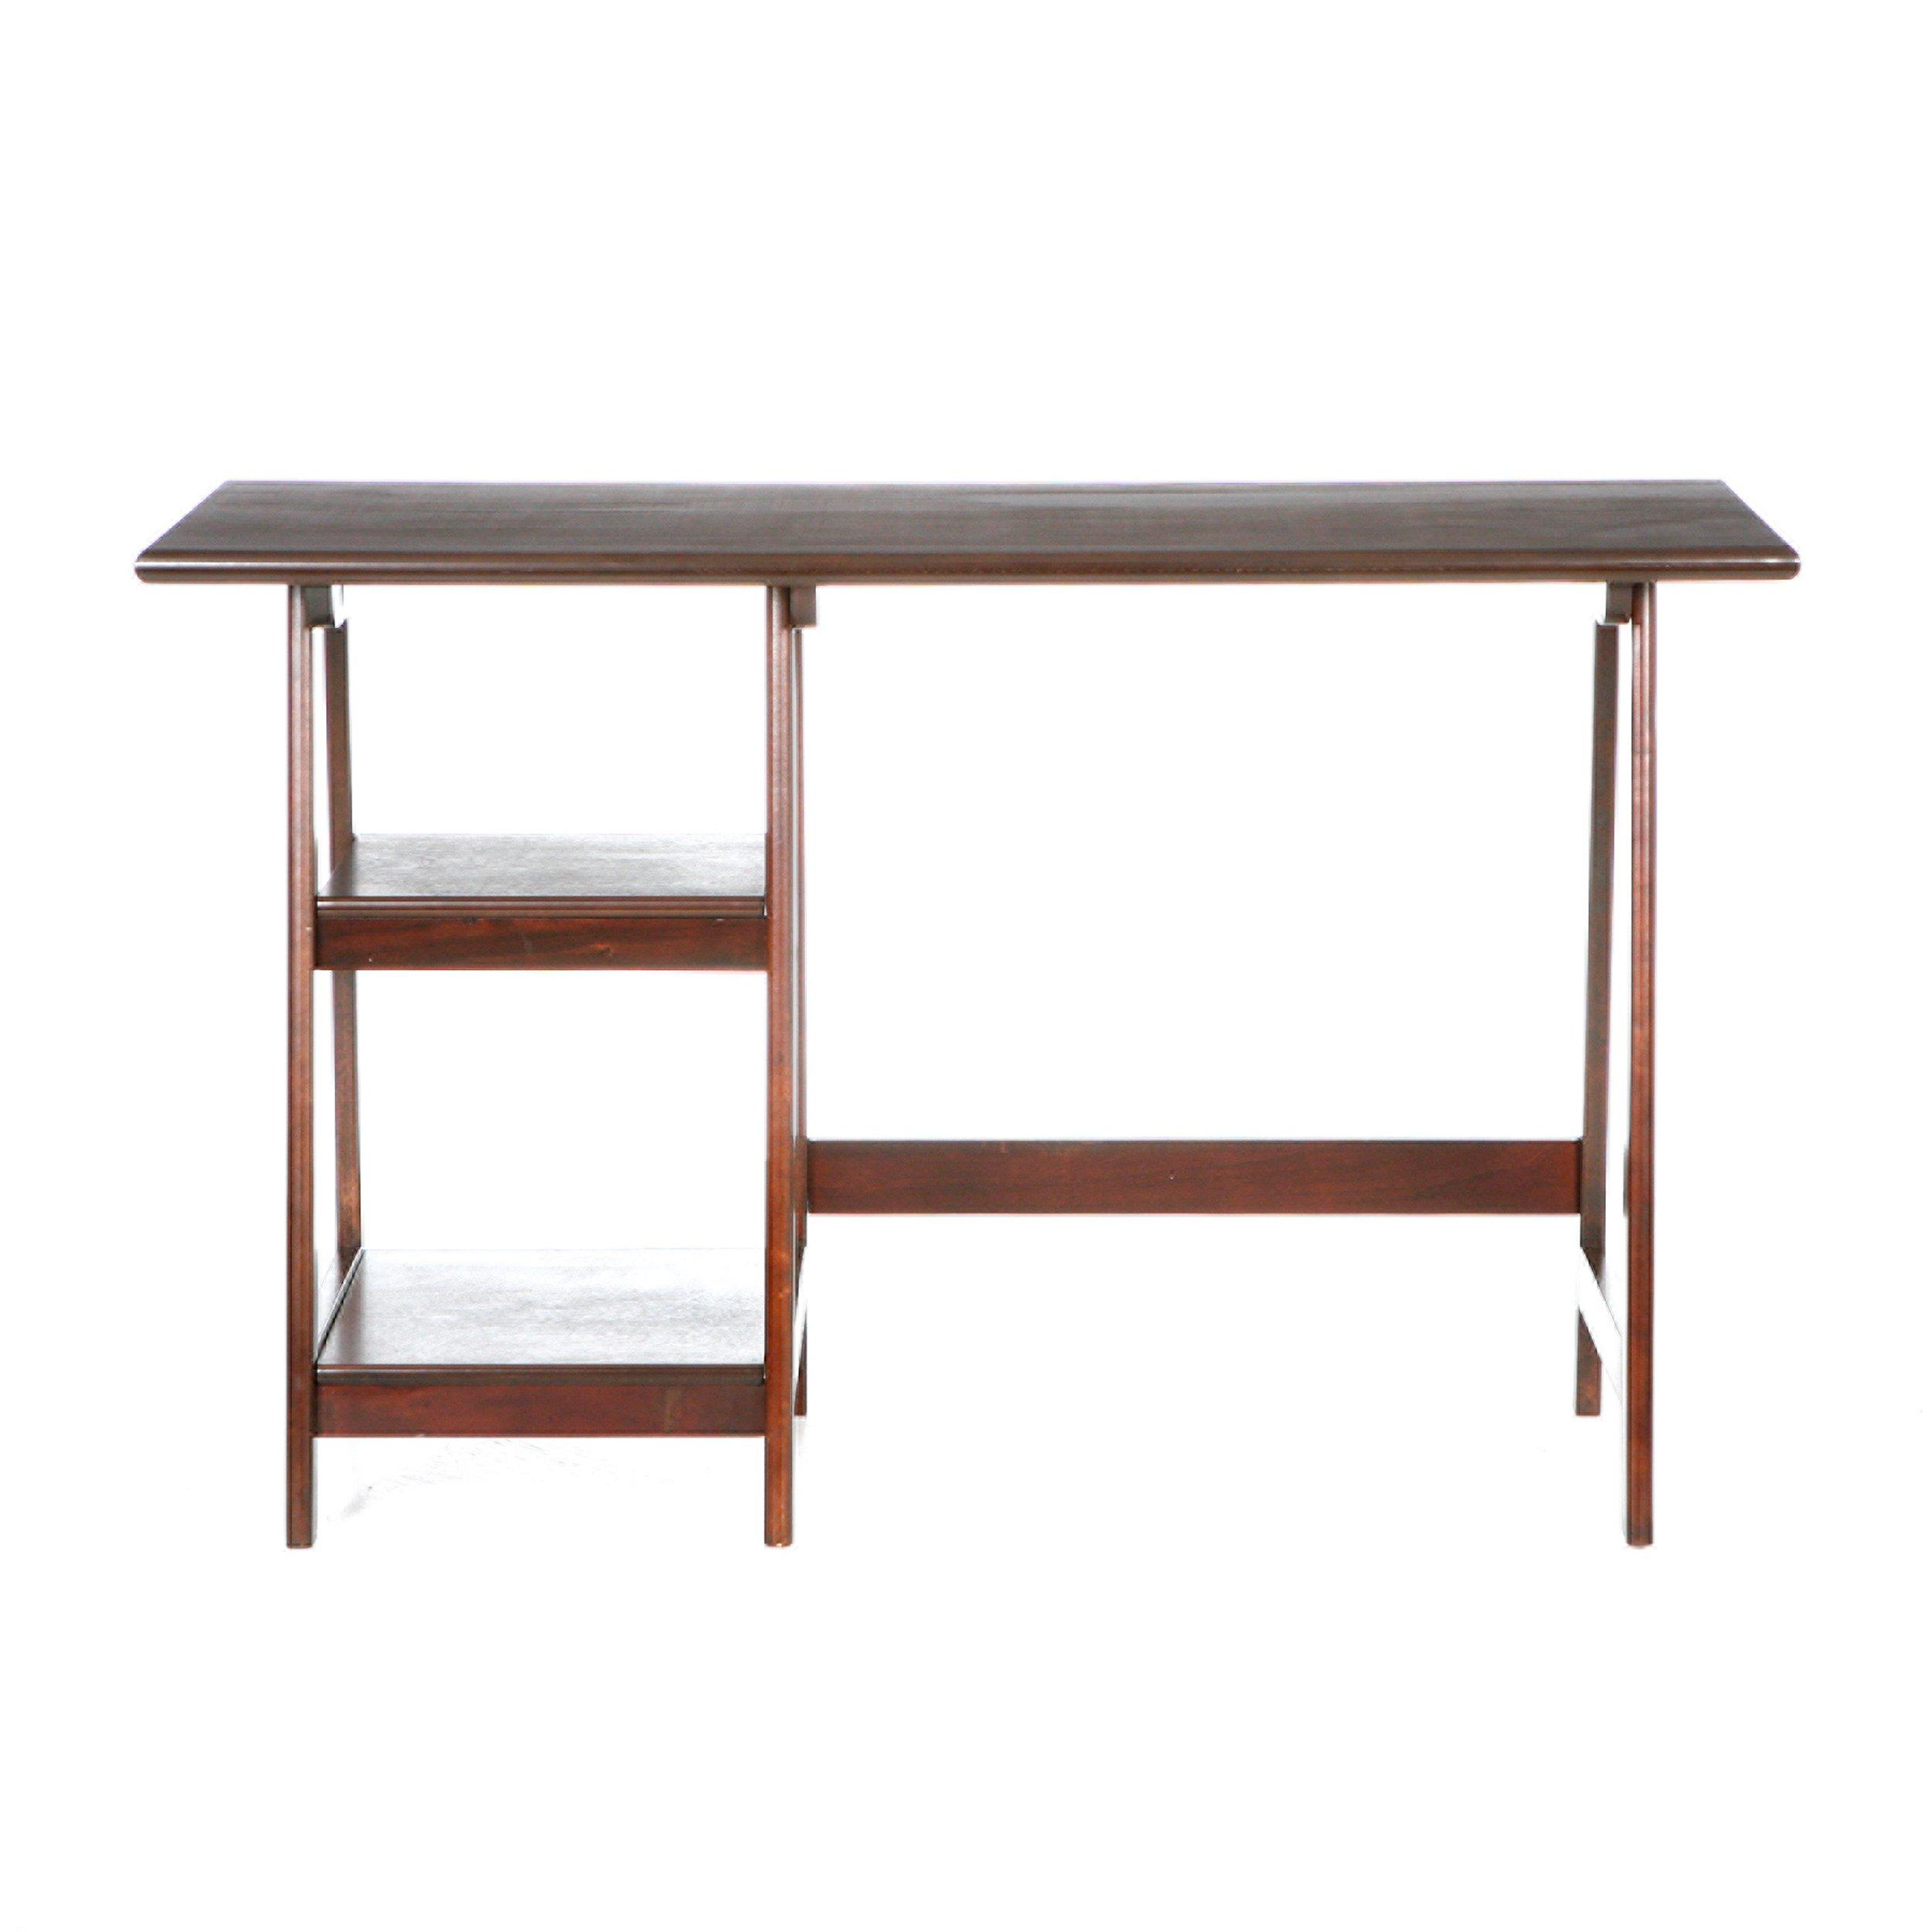 Southern Enterprises Langston A Frame Desk 47'' Wide, Espresso Finish